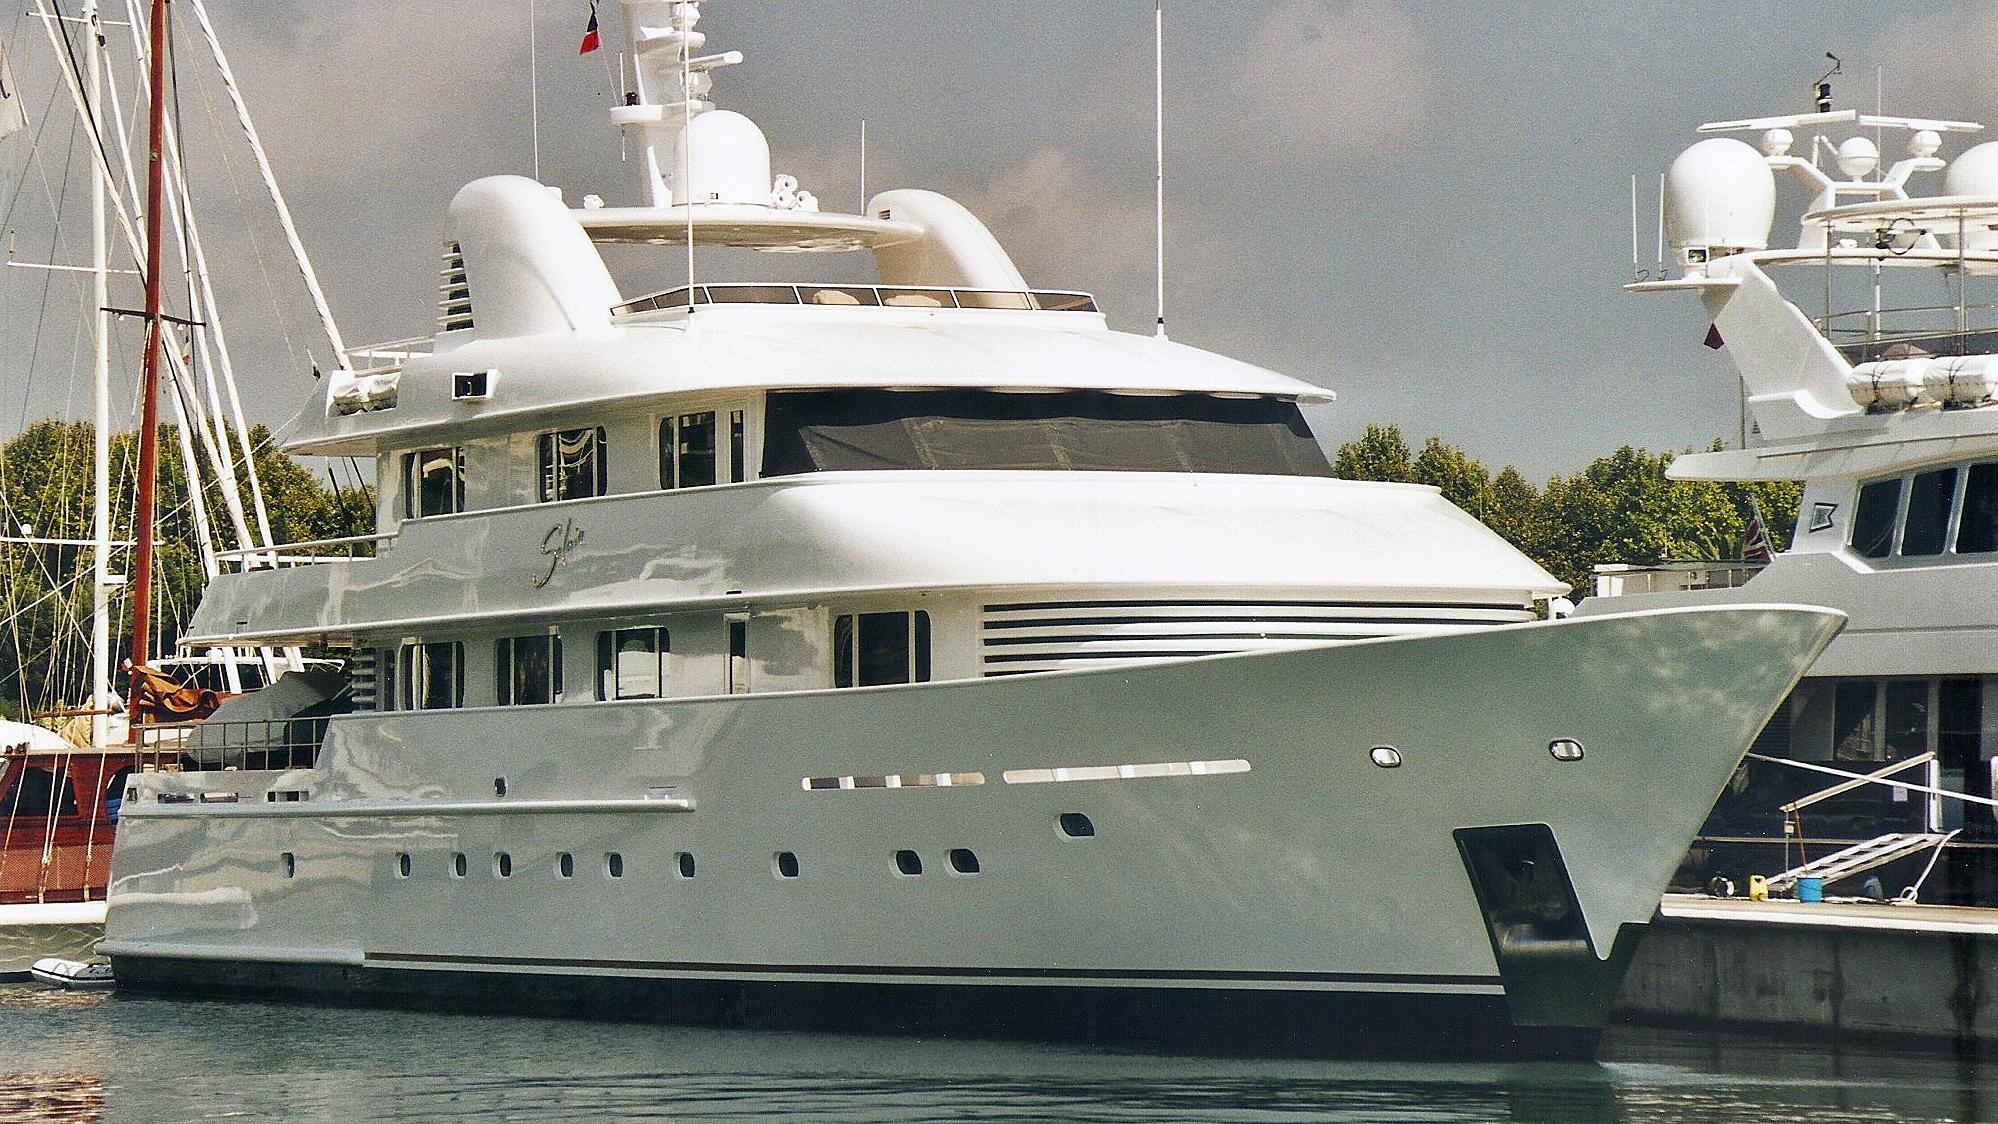 solaia-motor-yacht-hakvoort-2001-40m-bow-profile